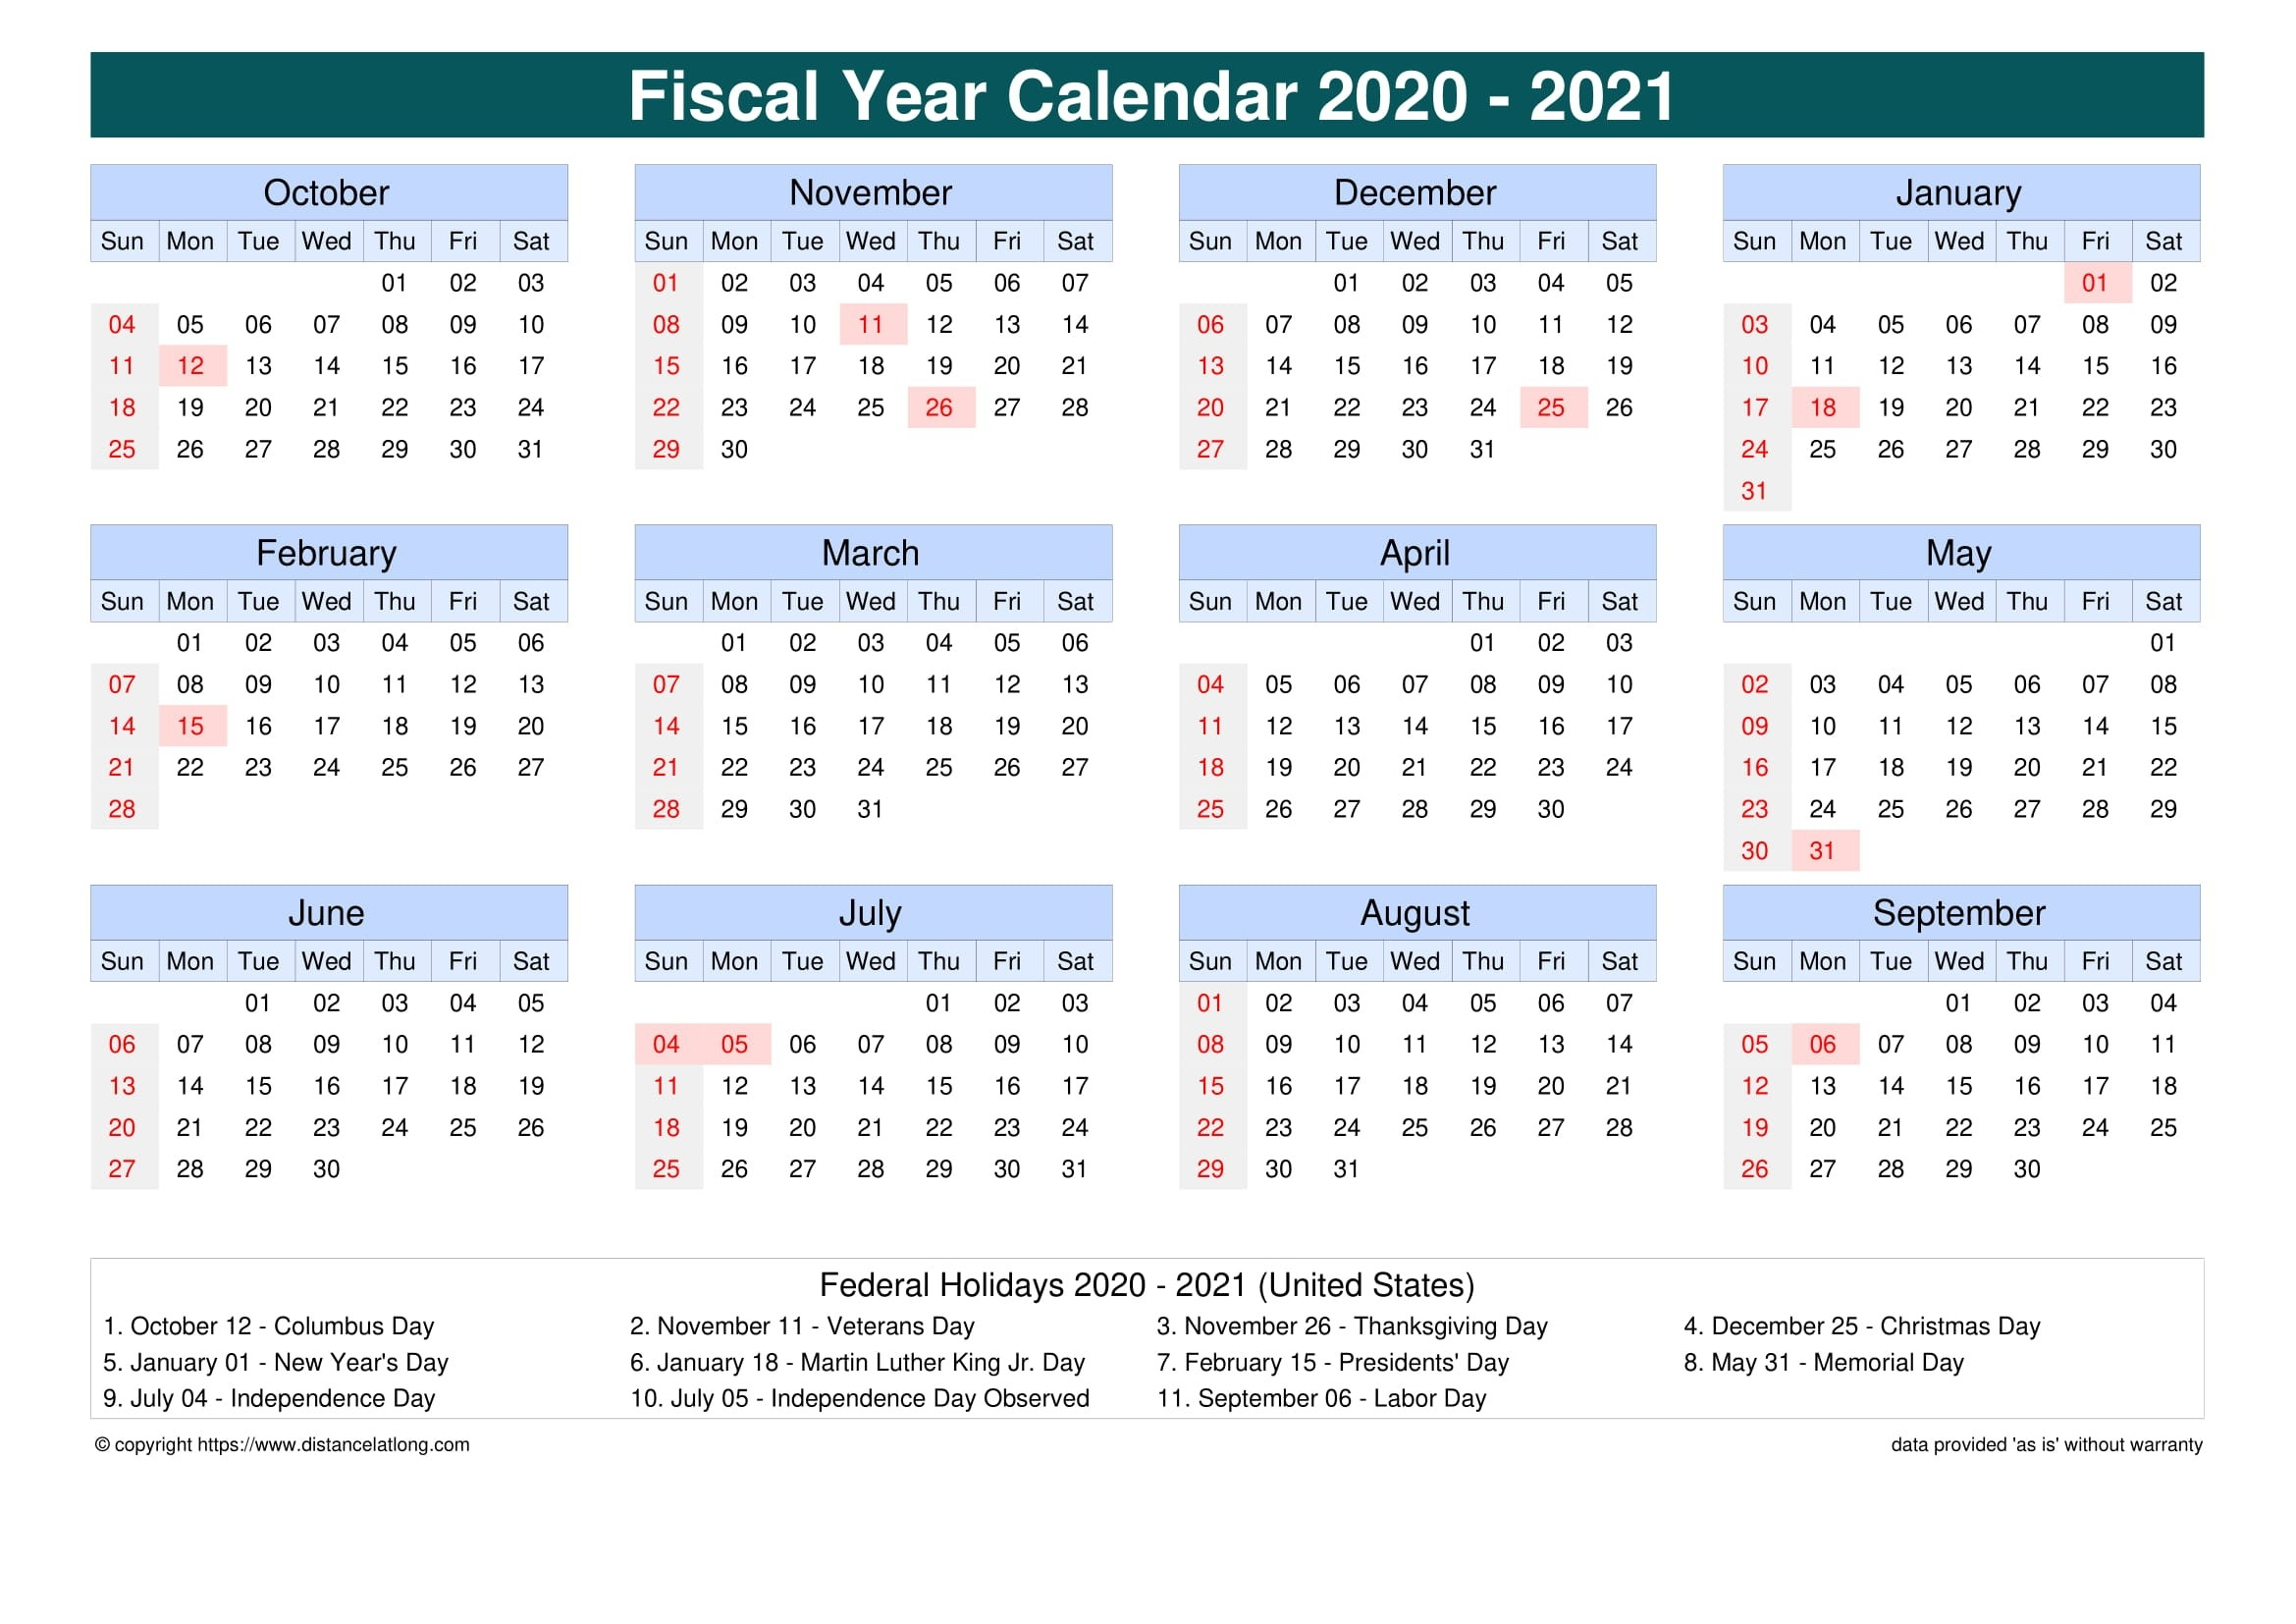 Fiscal Year 2020-2021 Calendar Templates, Free Printable-Fiscal Calendar For October 2021